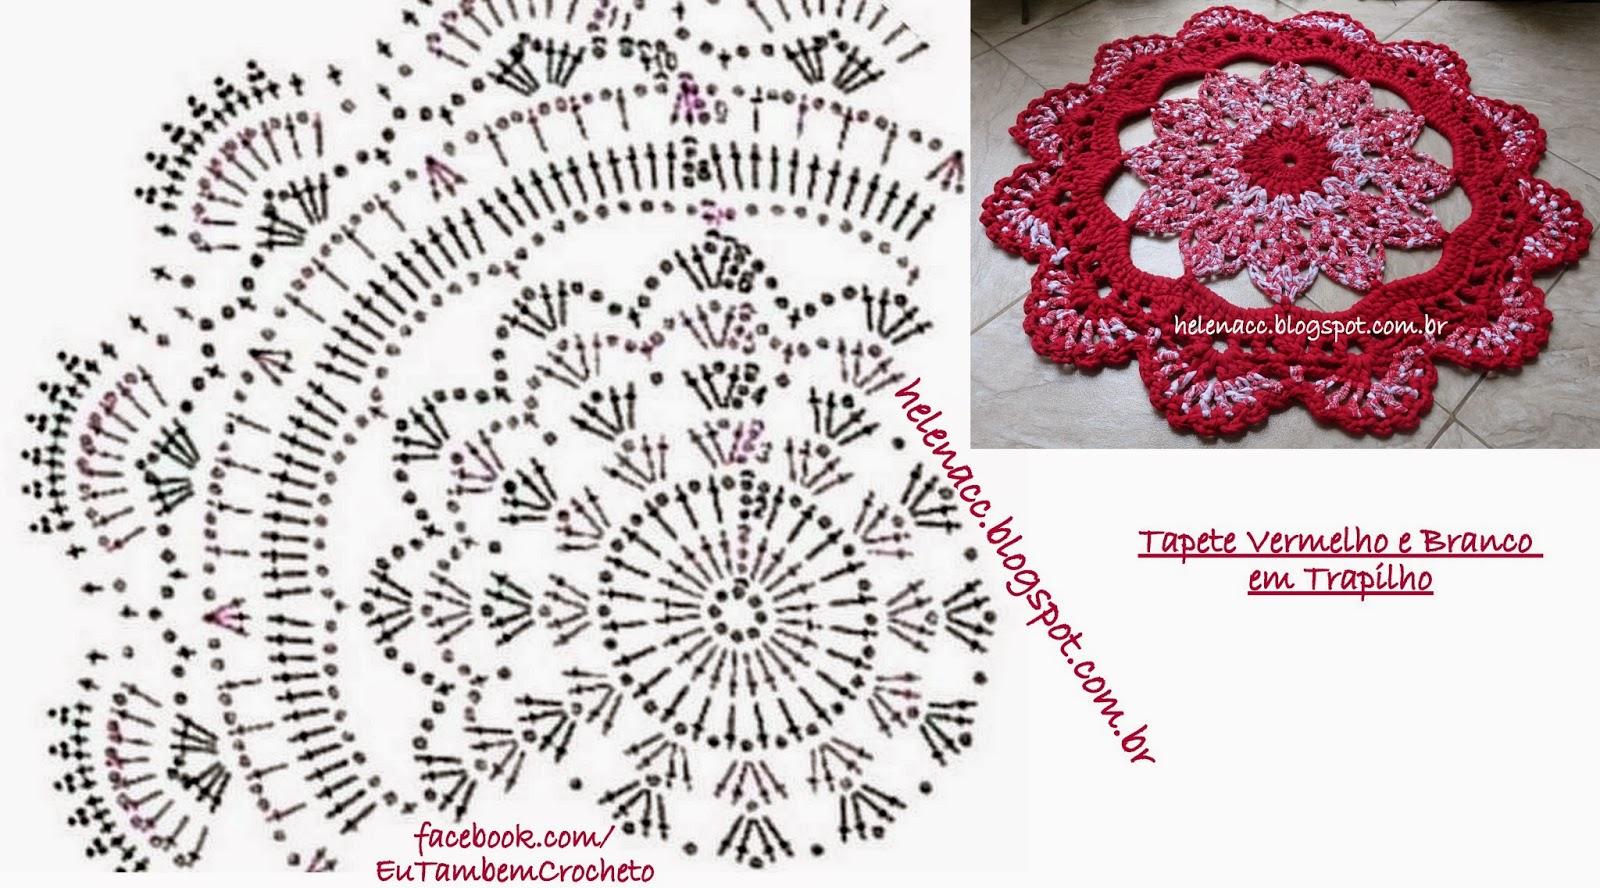 Вязание крючком ковриков на пол: схема, фото